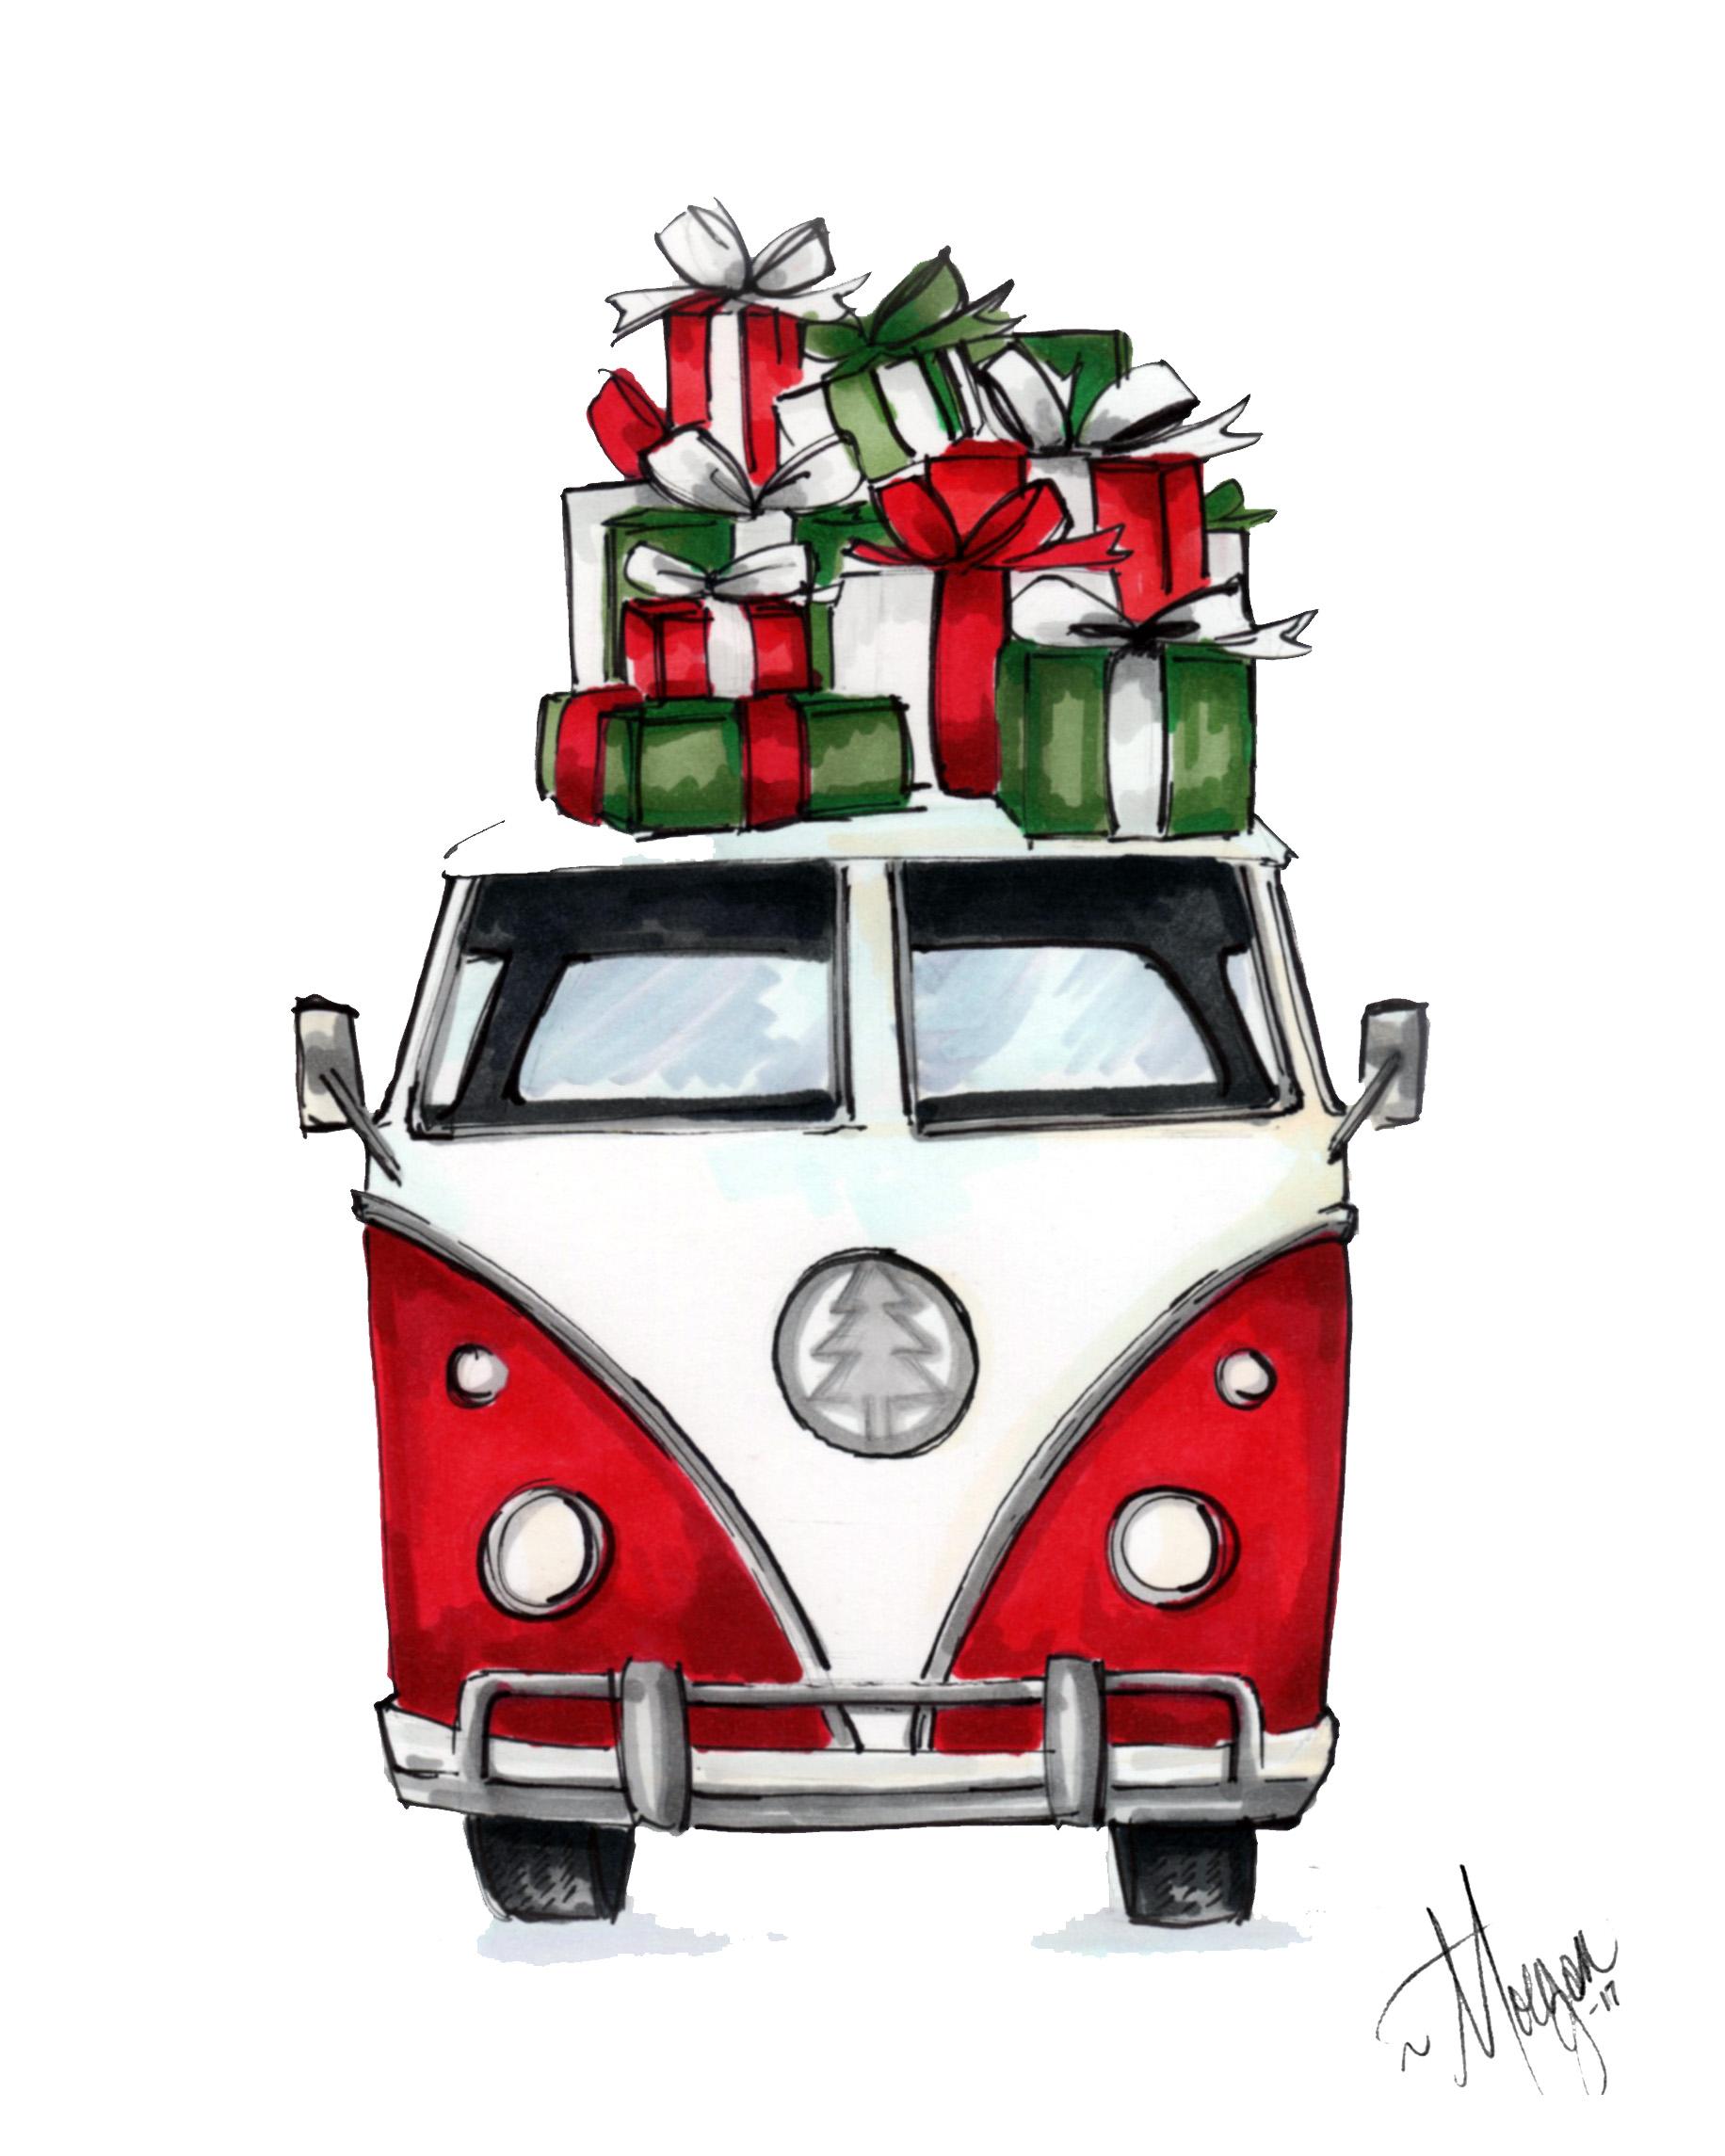 van-with-gifts-illustration-morgan-swank-studio.jpg